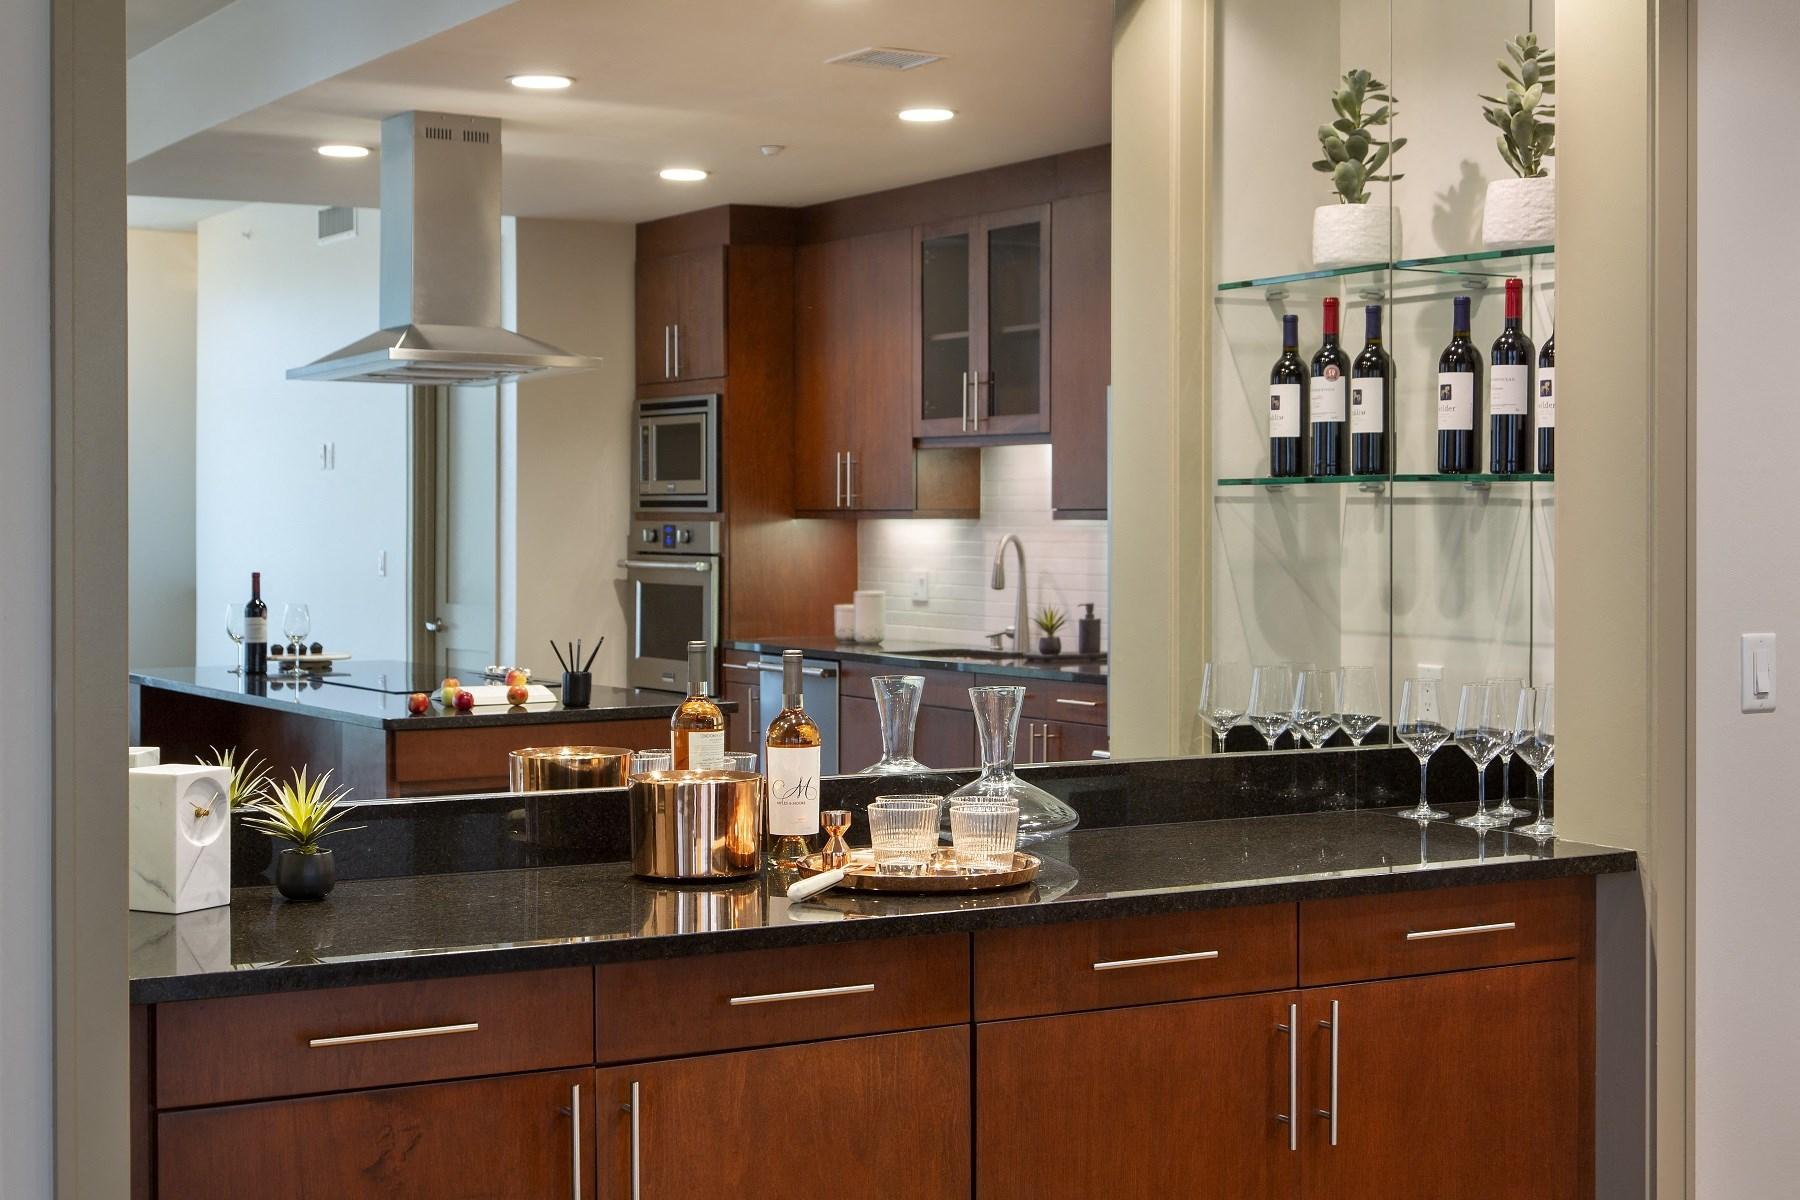 Westwood-Luxury-Apartments-Wilshire-Victoria-Unit-502-Dry-Bar-Granite-Countertops